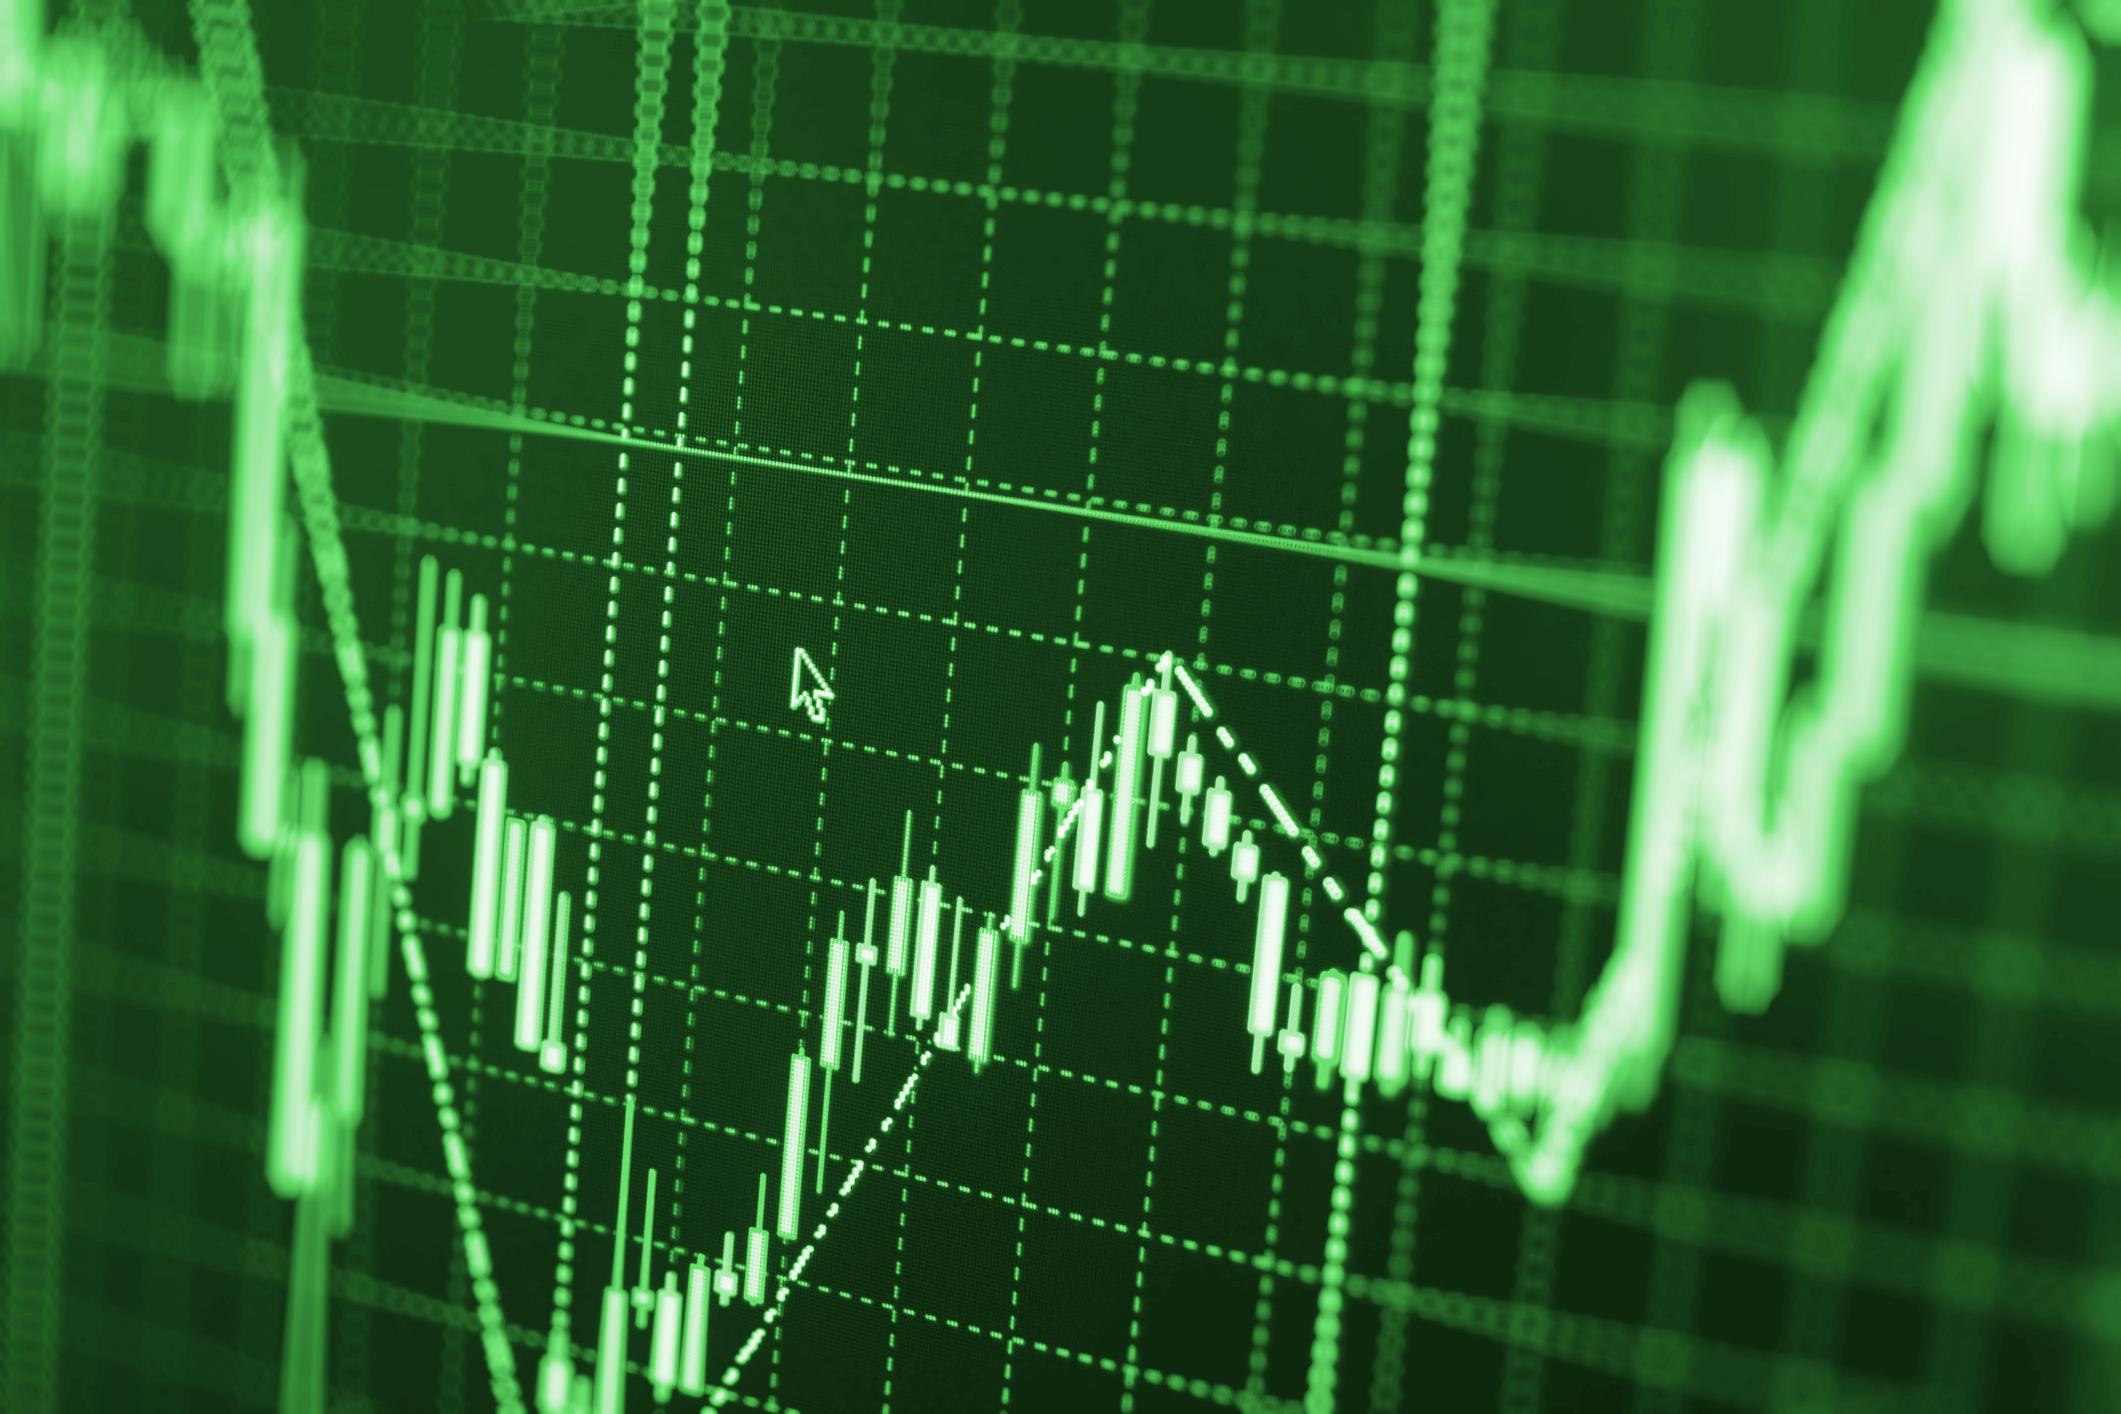 8x8 Eght Stock Price News The Motley Fool